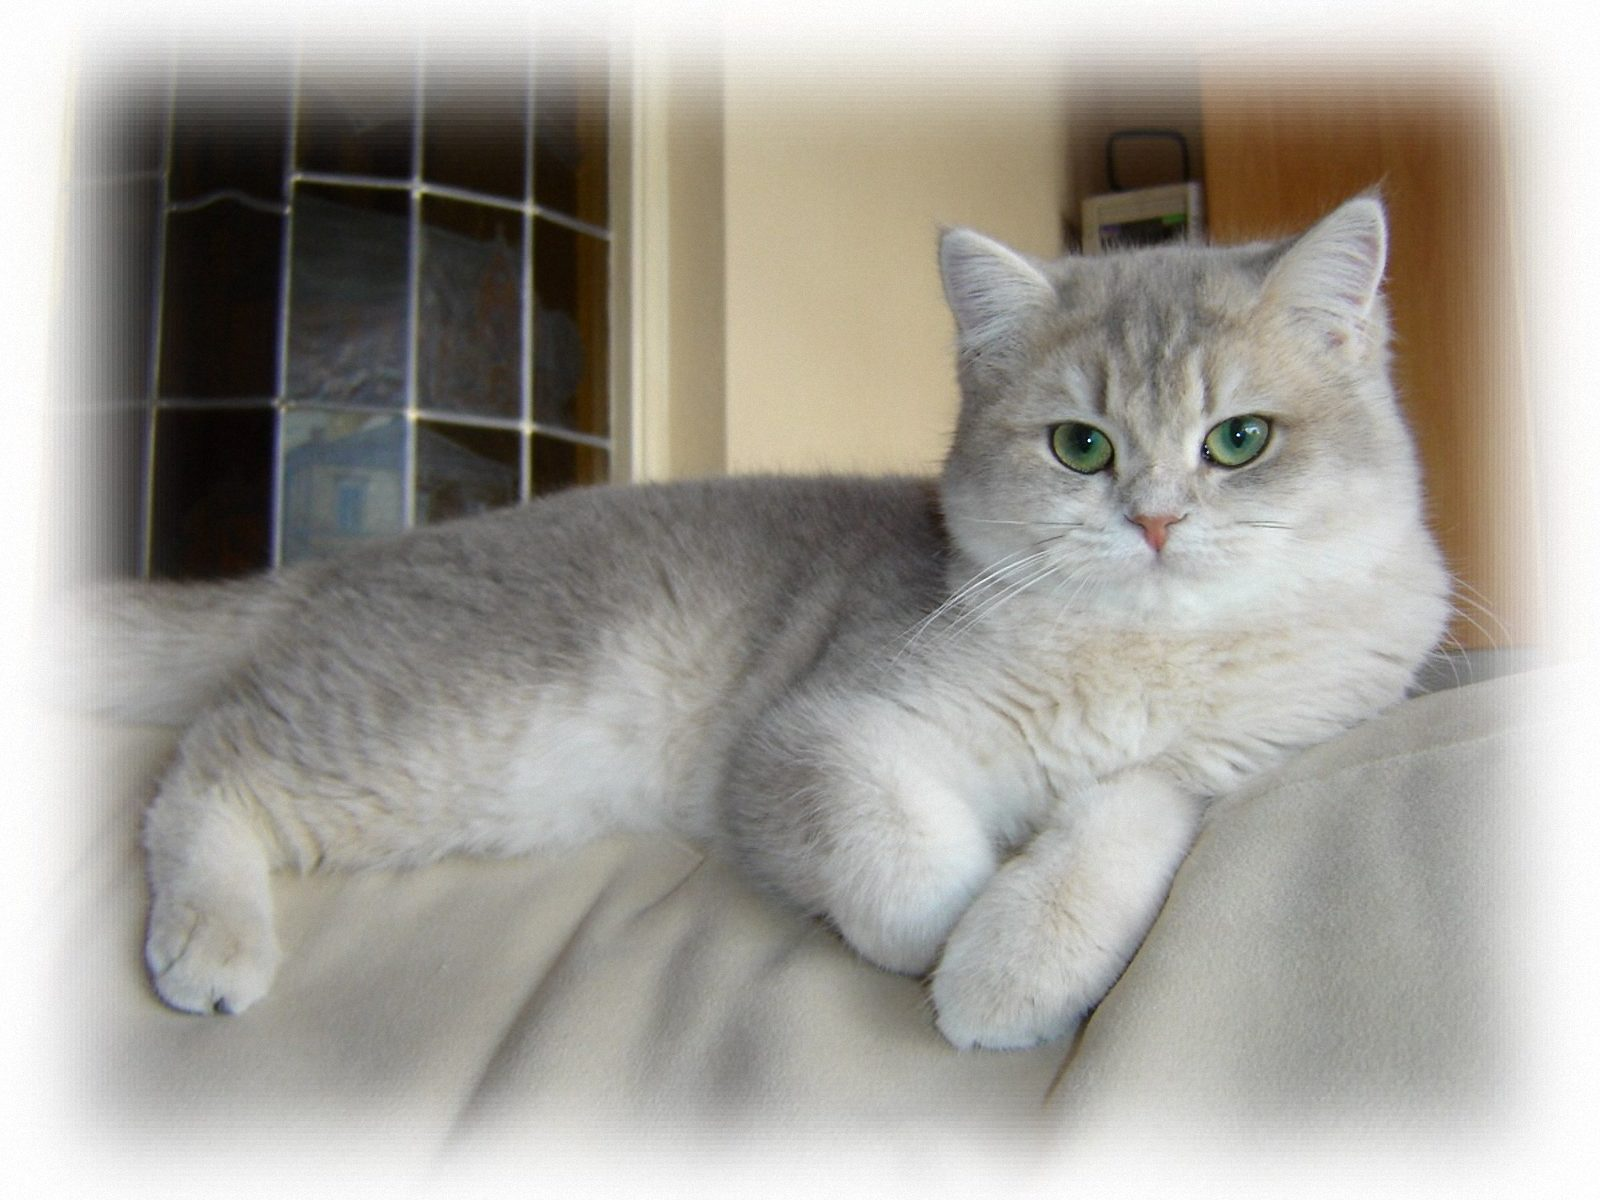 cats-funny-cats-british-shorthair_1600x1200_97675